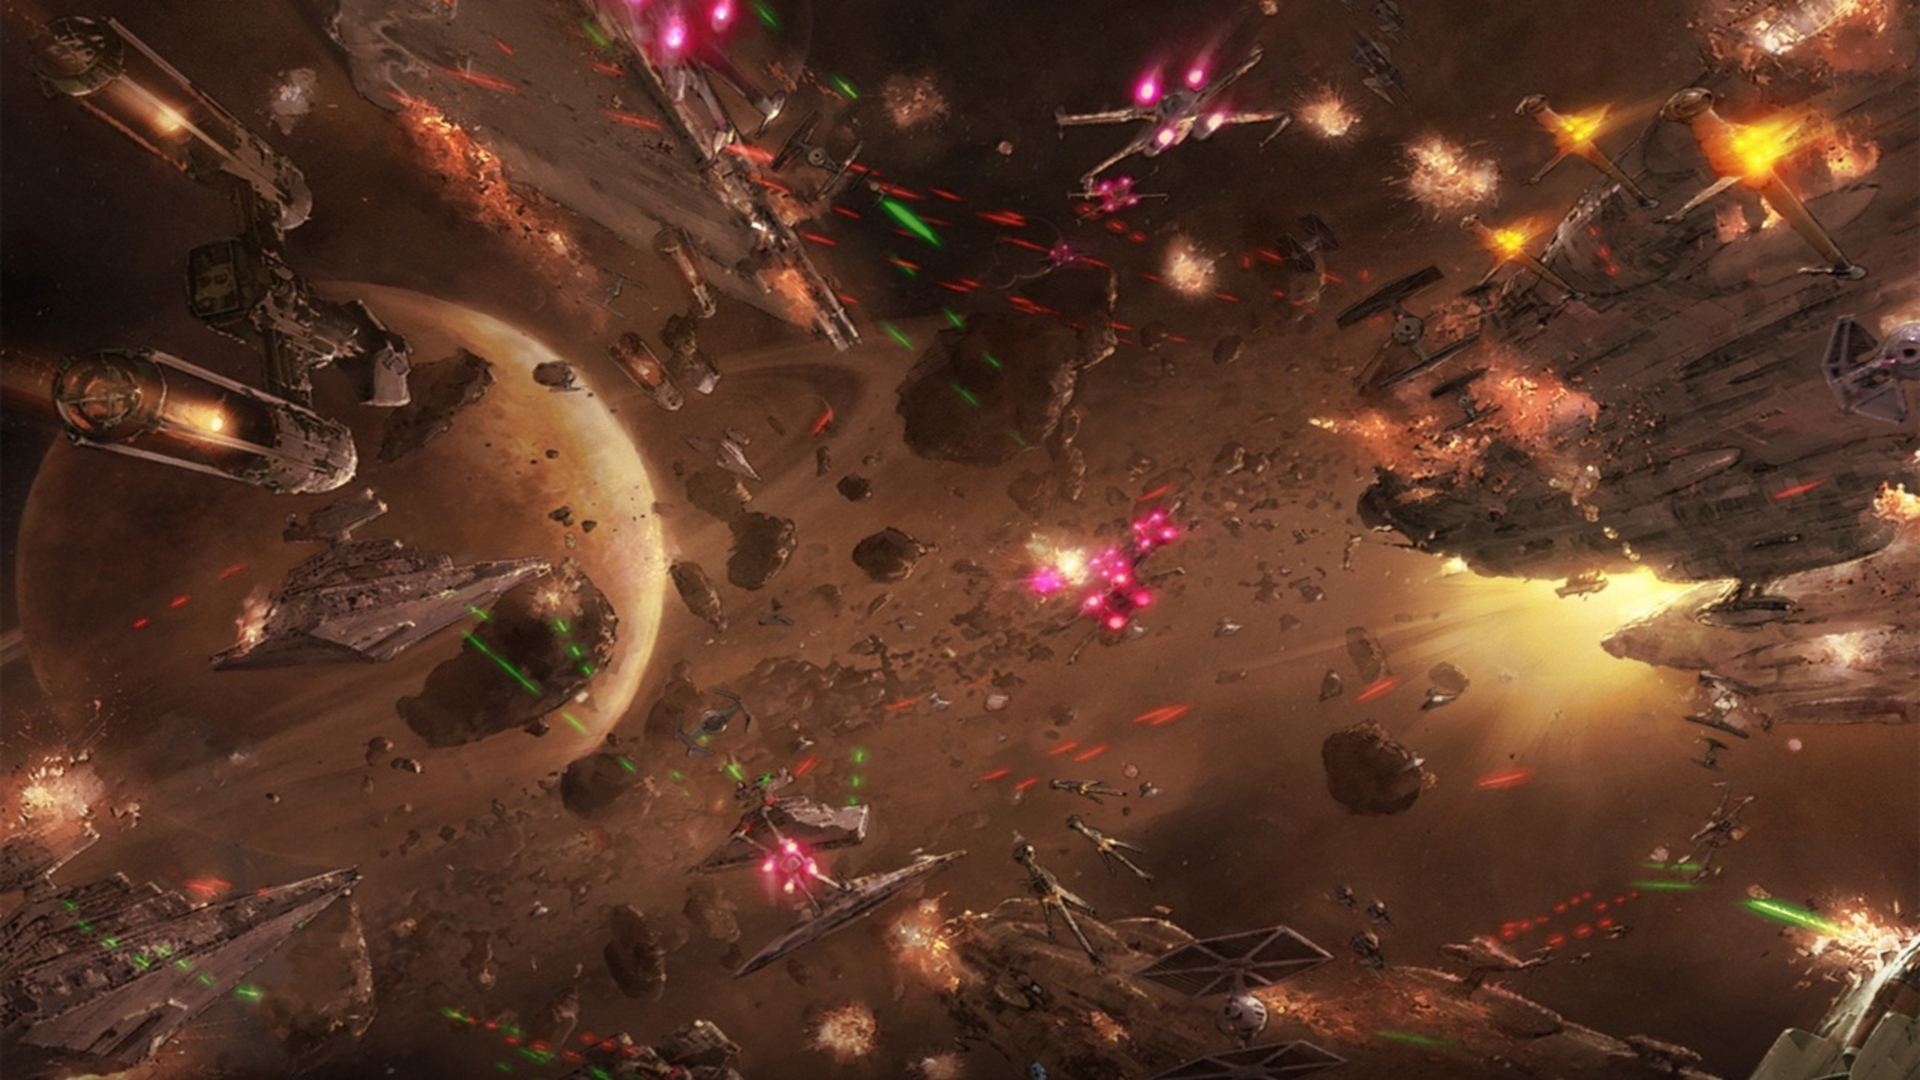 Free Download Star Wars Space Battle Hd Wallpaper 1920x1080